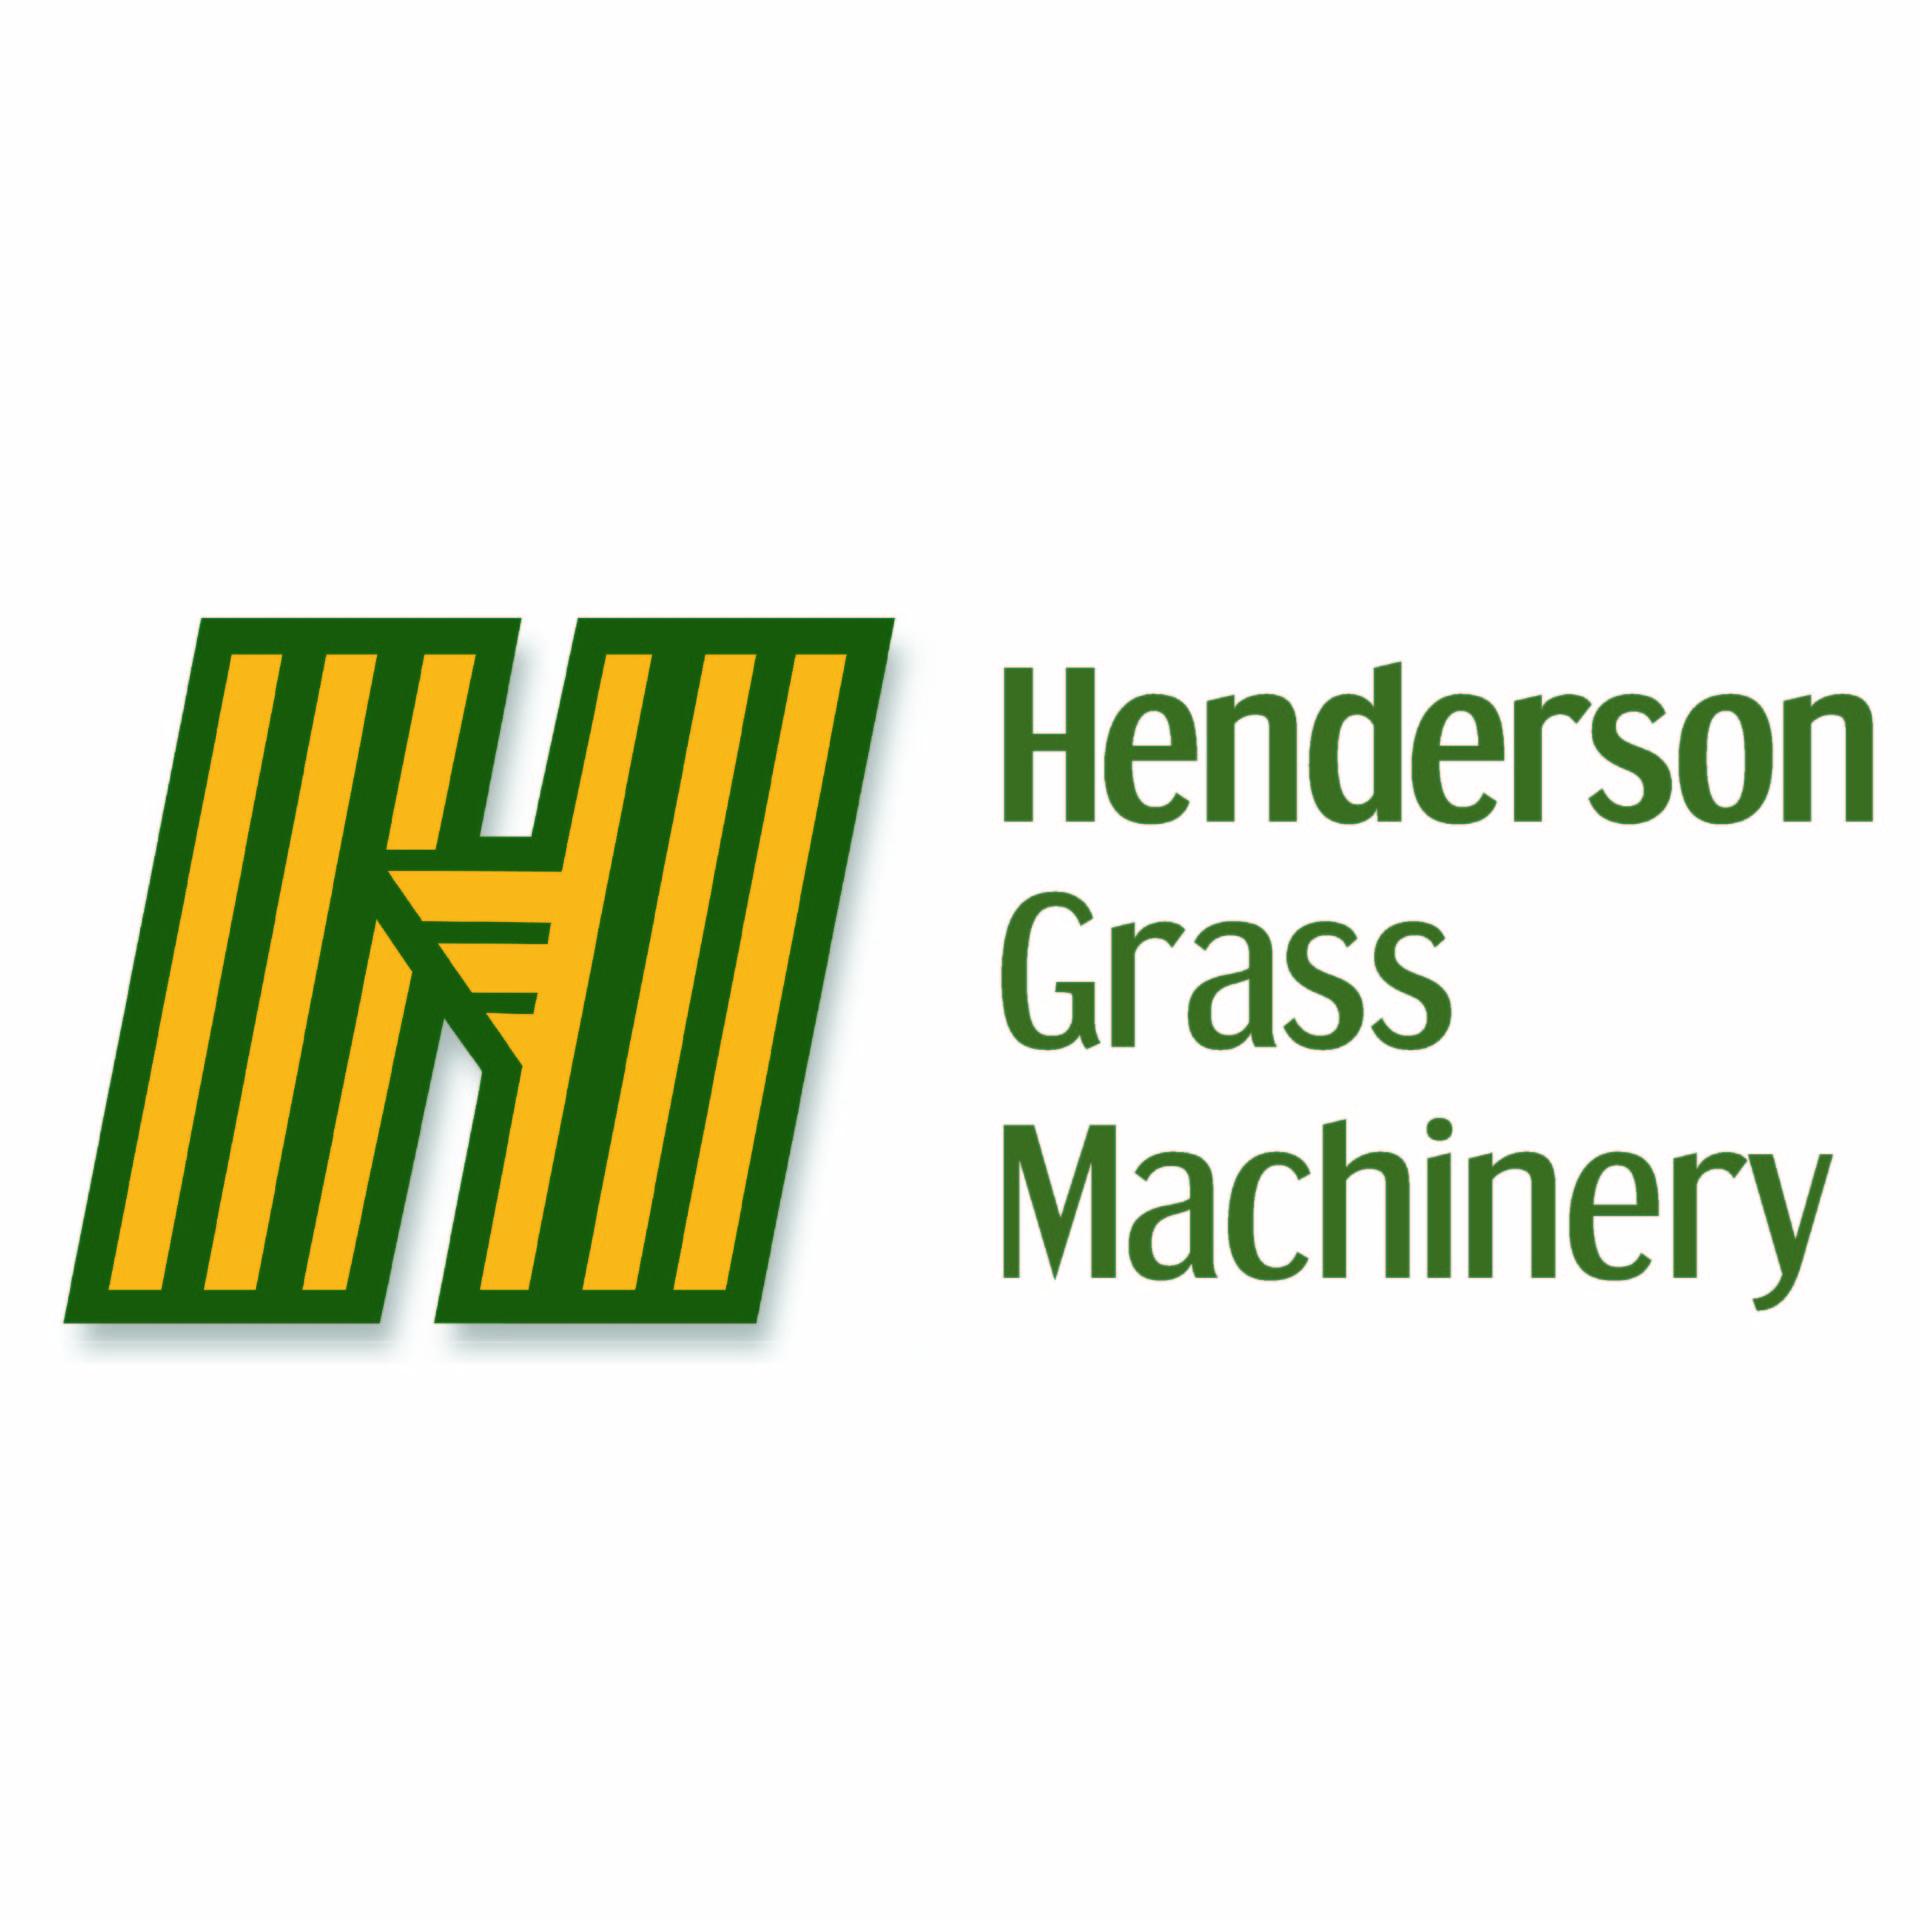 Henderson Grass Machinery logo